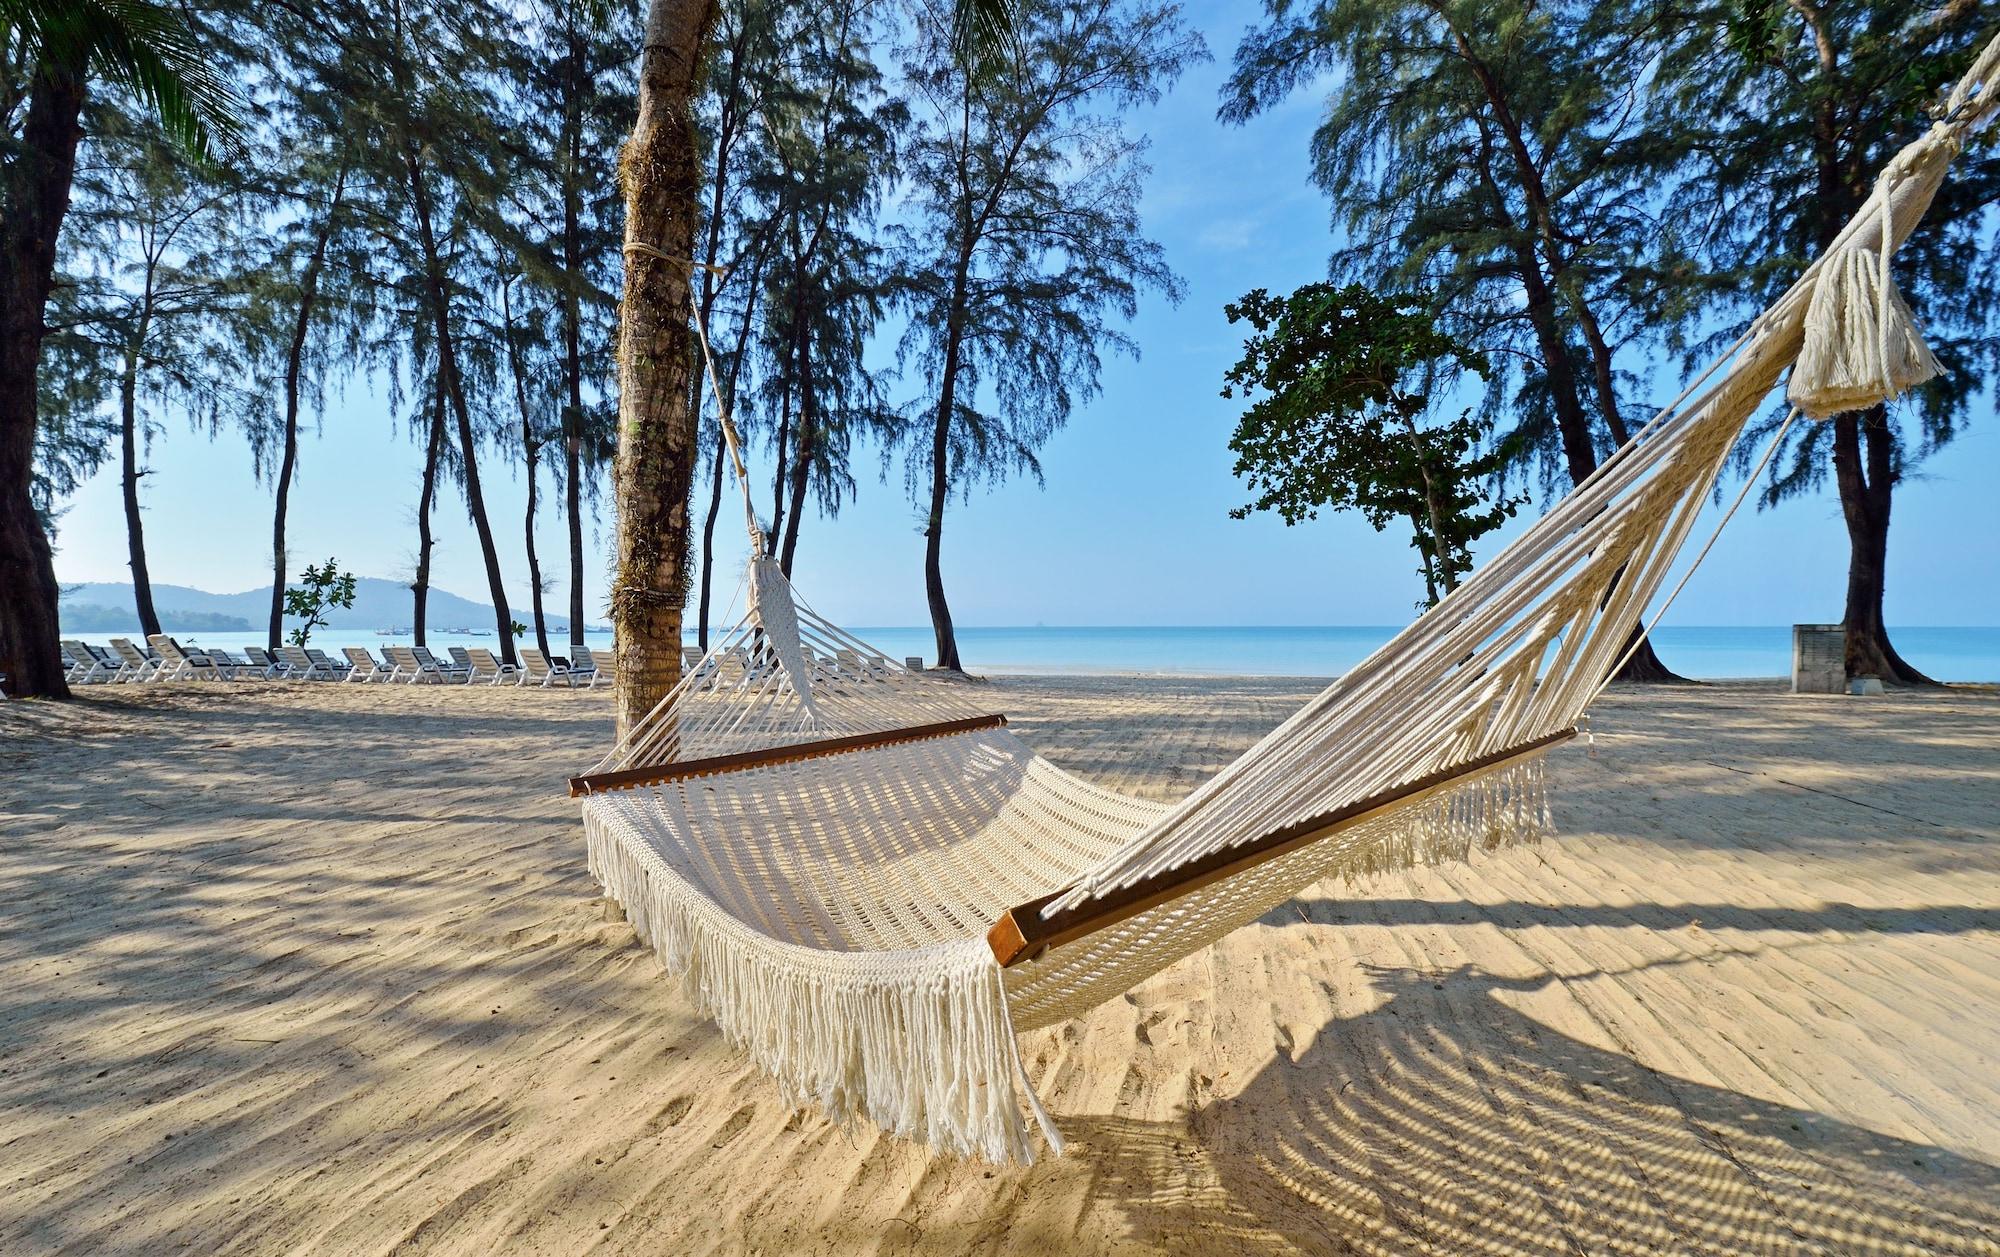 Dusit Thani Krabi Beach Resort, Muang Krabi